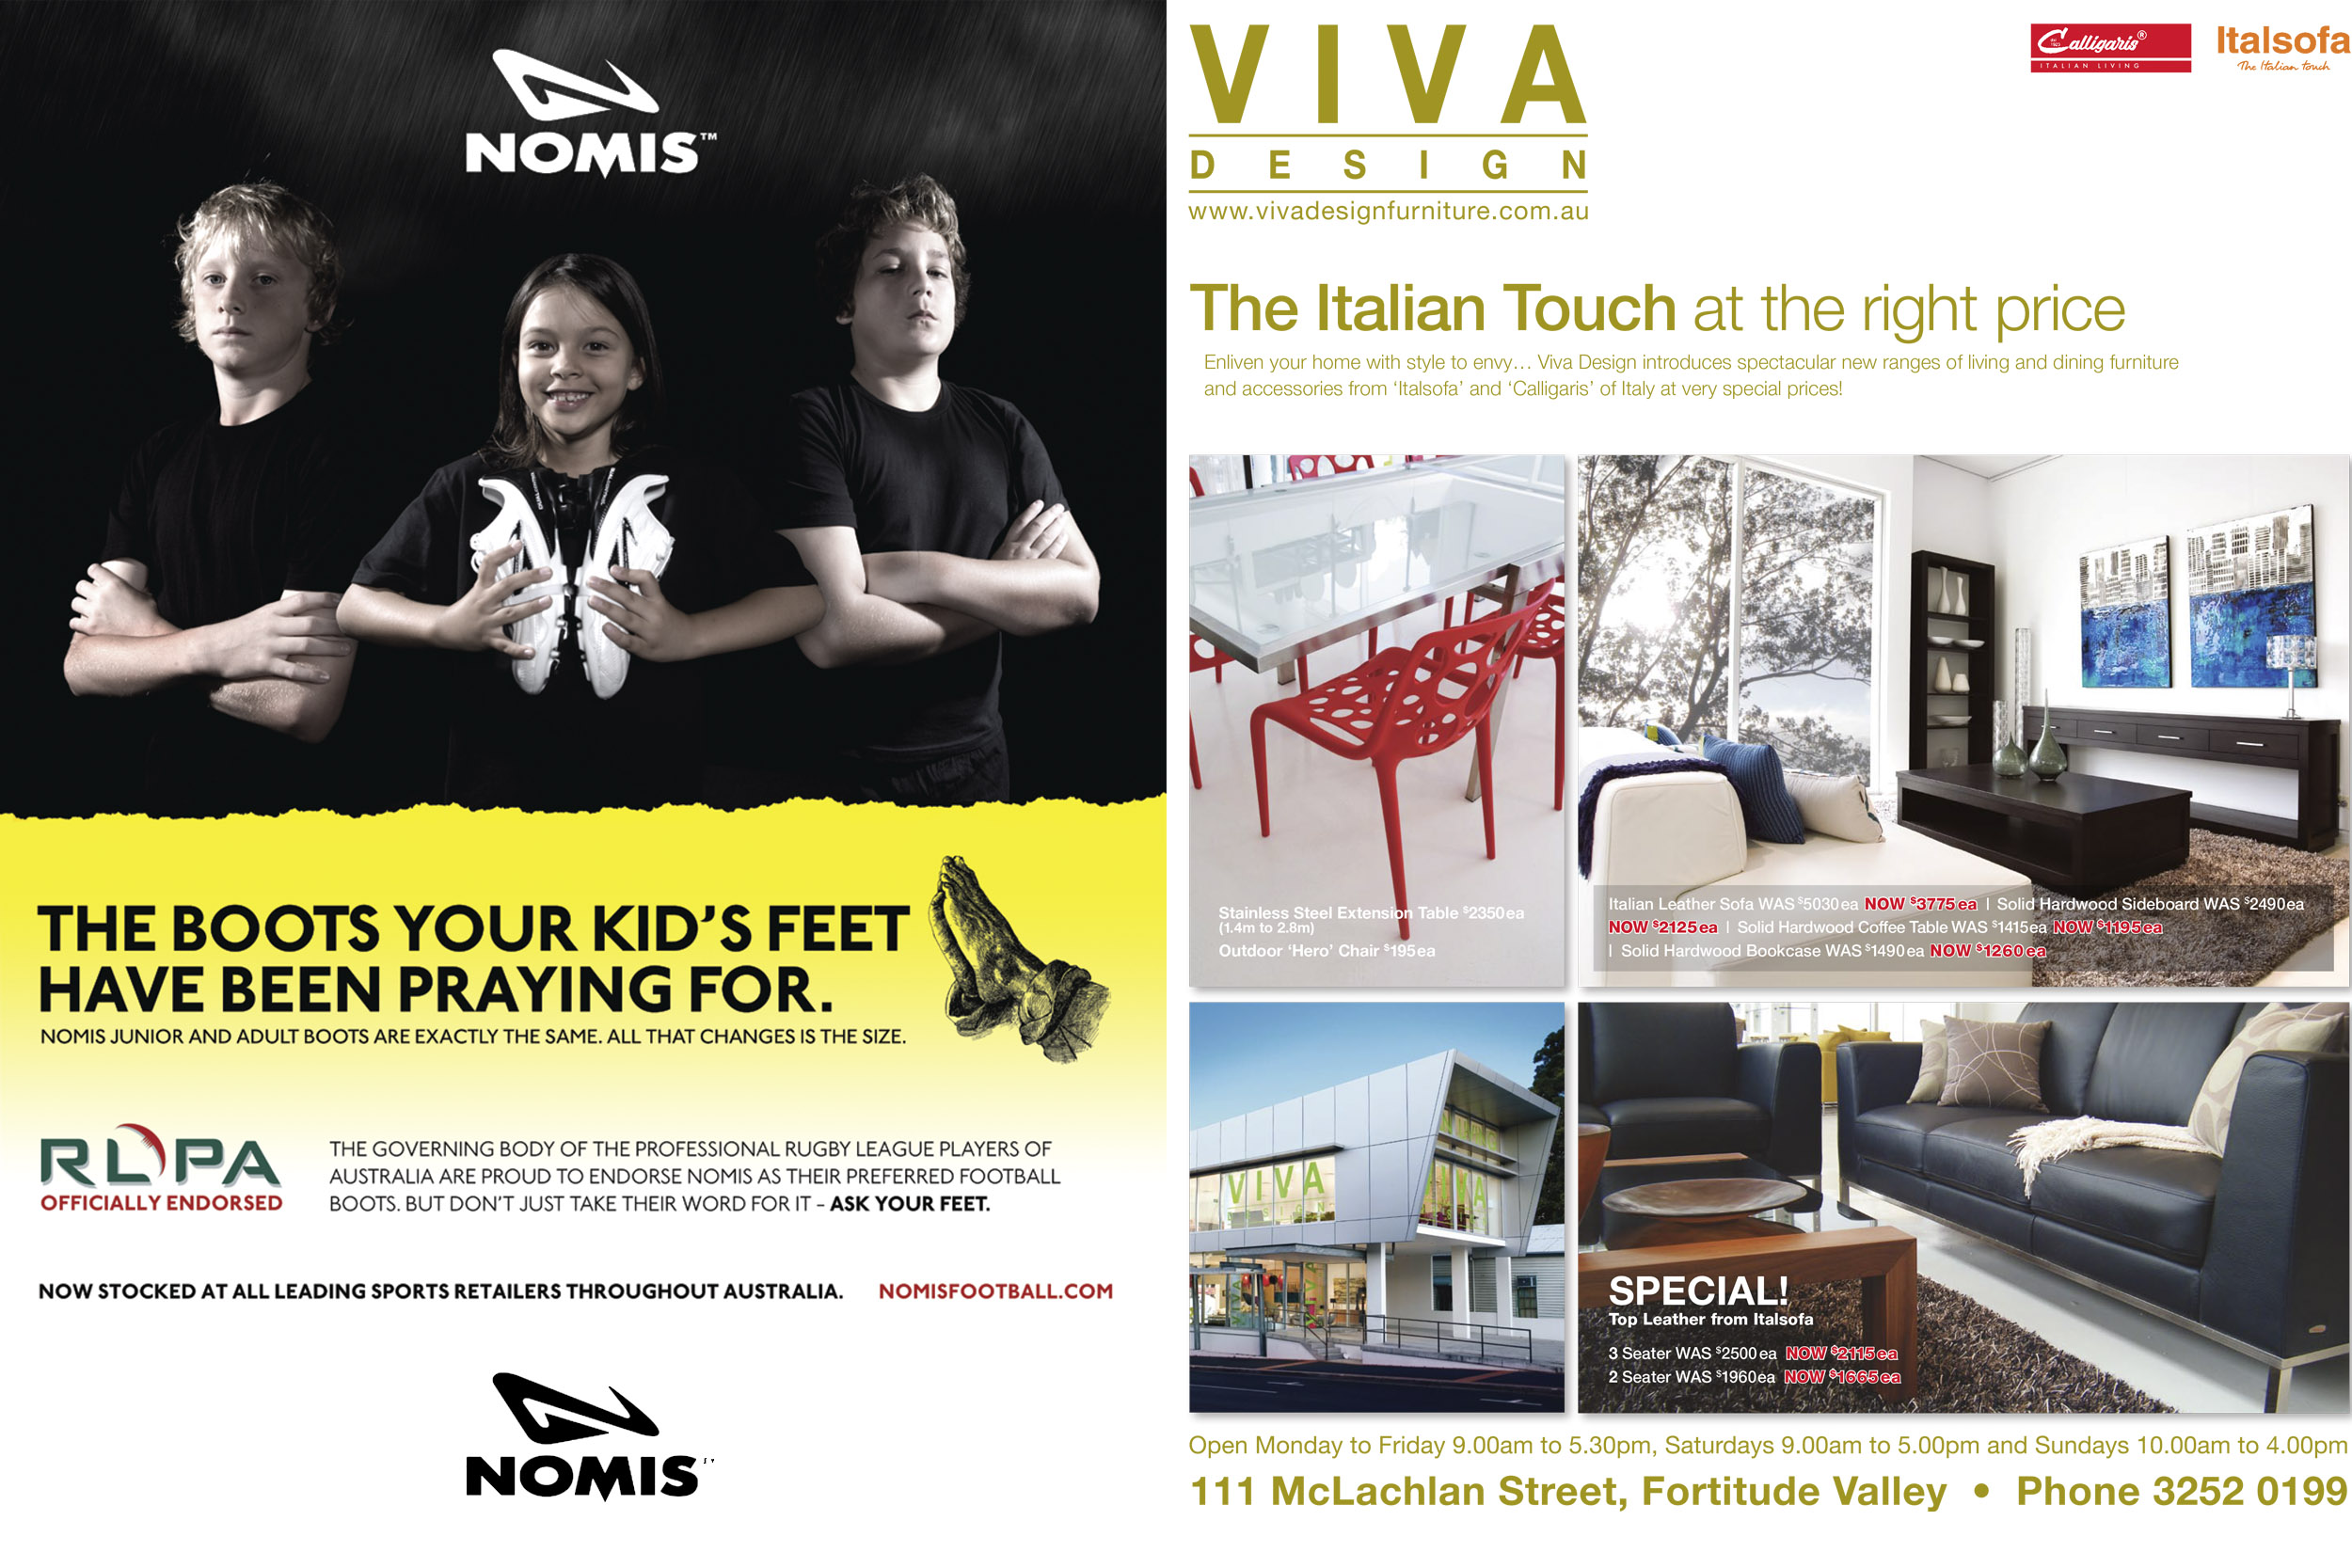 Nomis / Viva